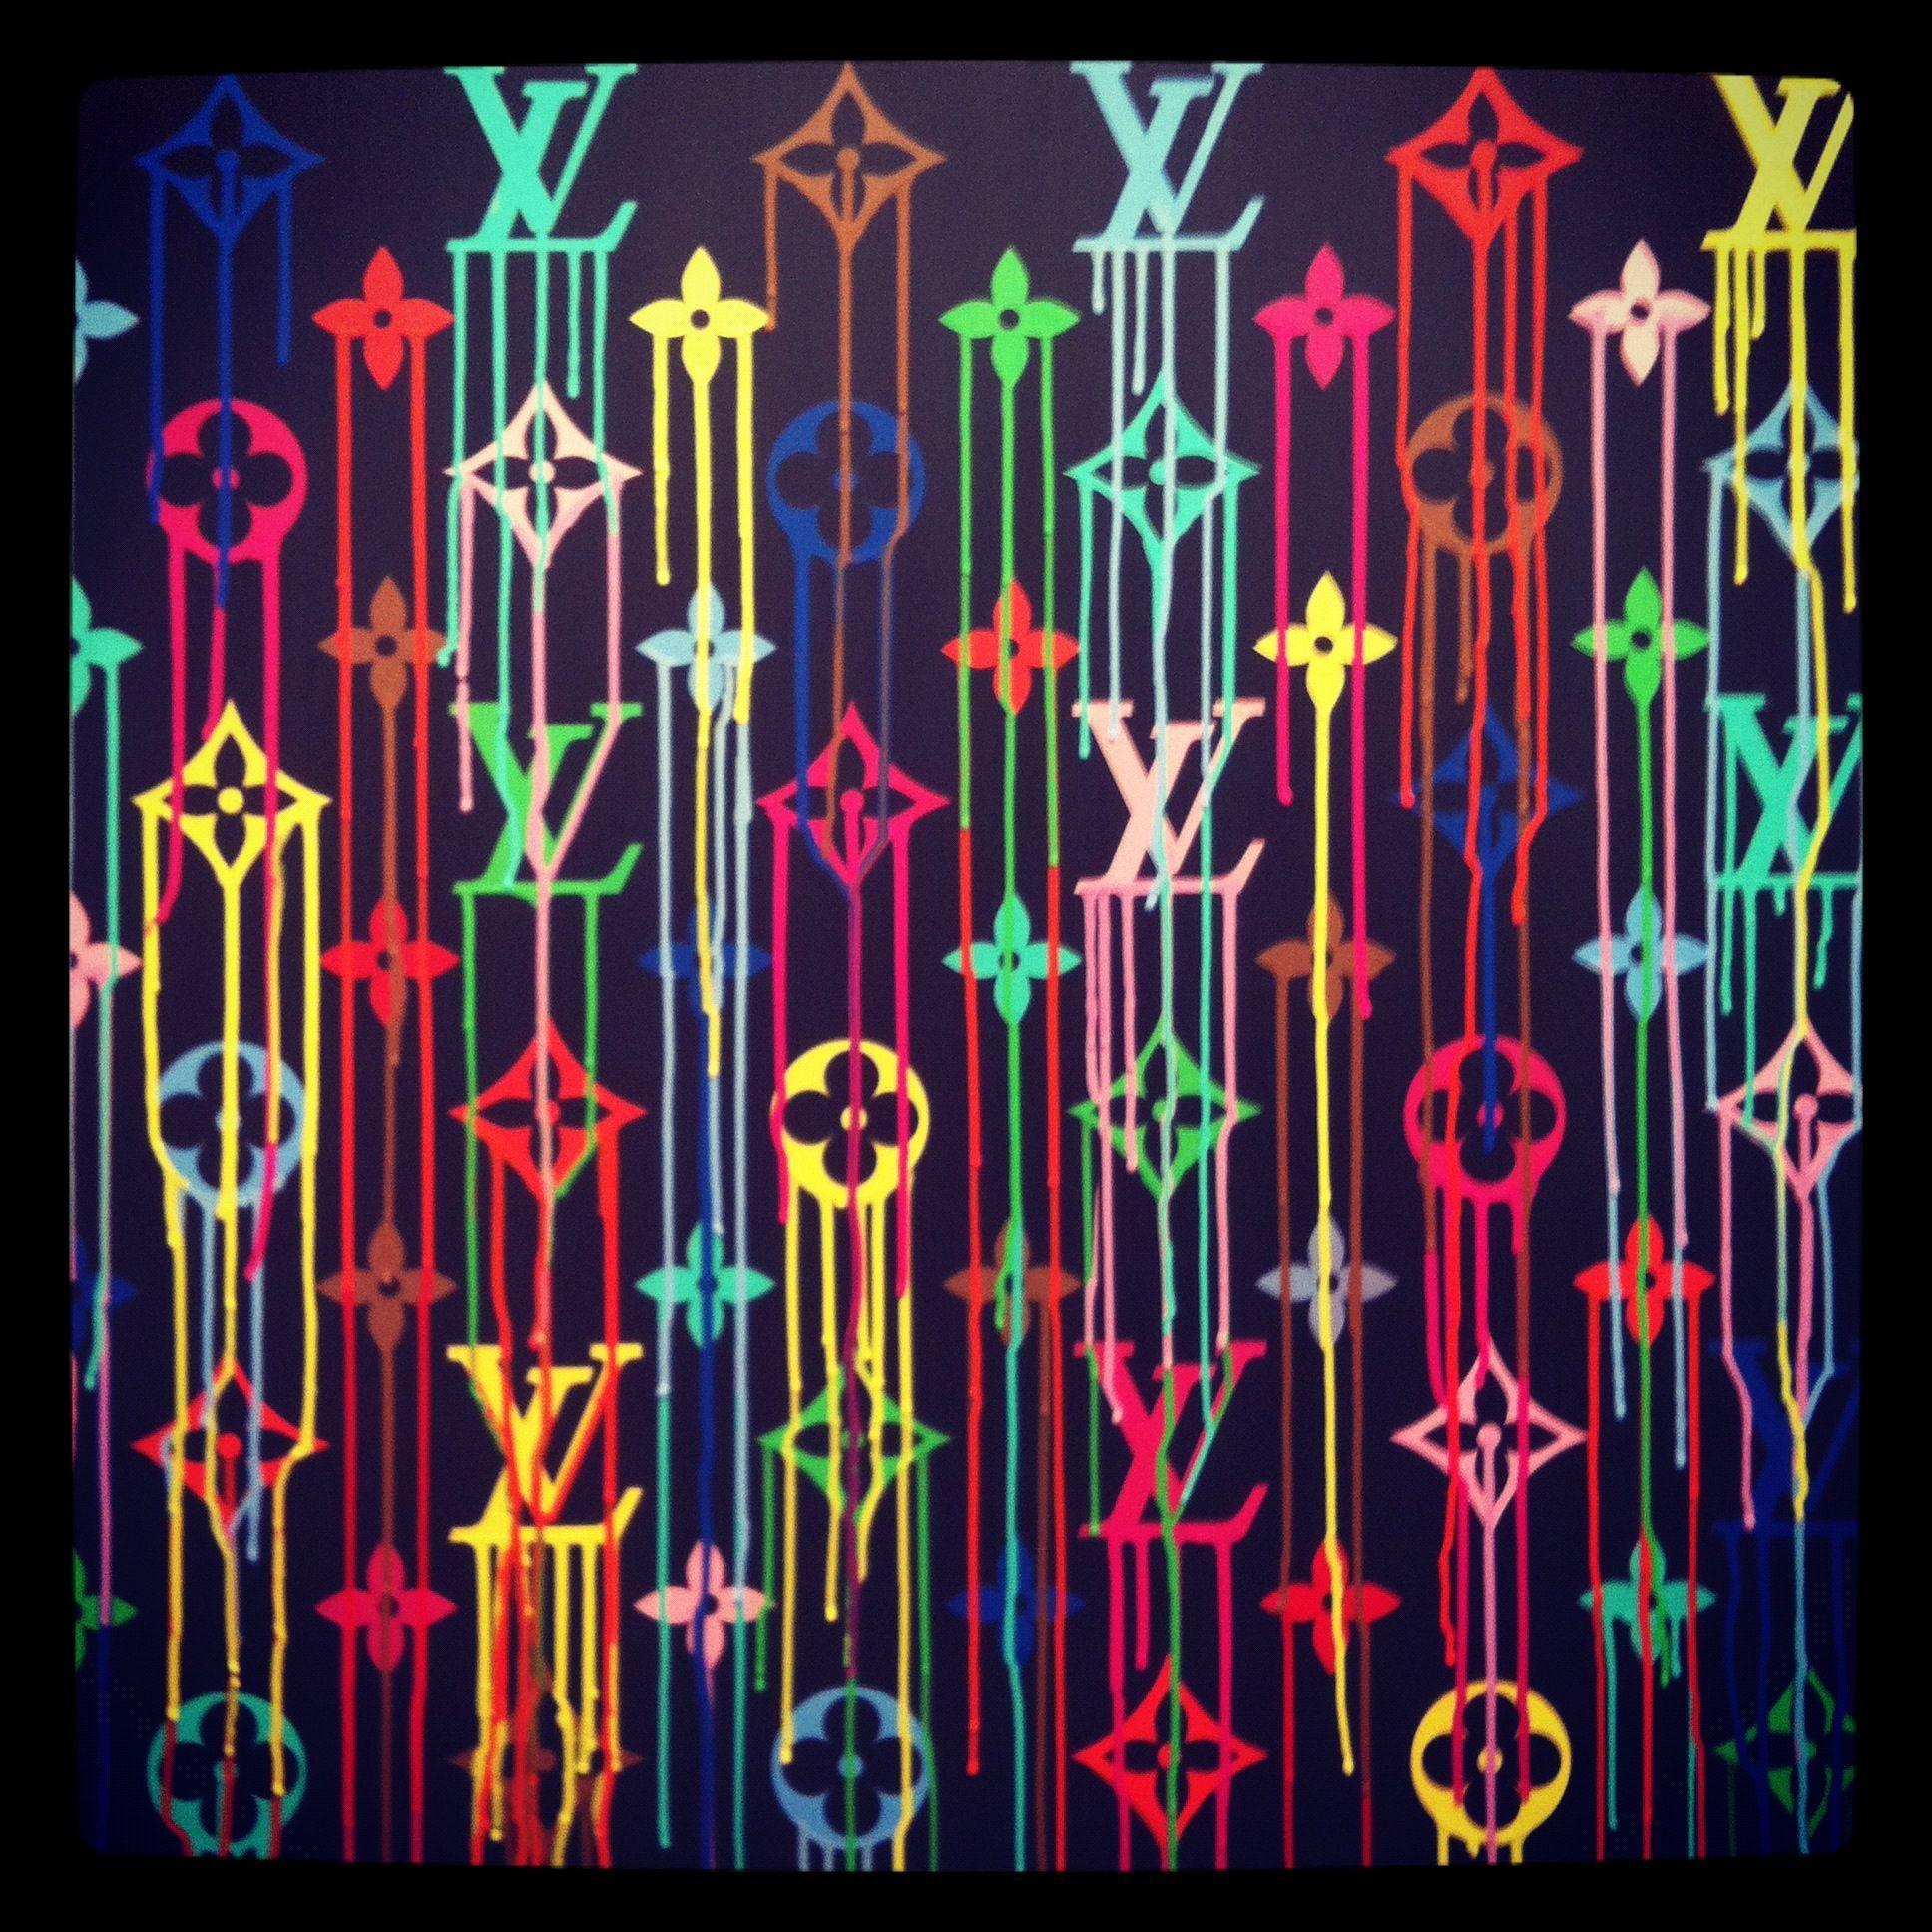 Aesthetic Louis Vuitton Neon Wallpapers Wallpaper Cave